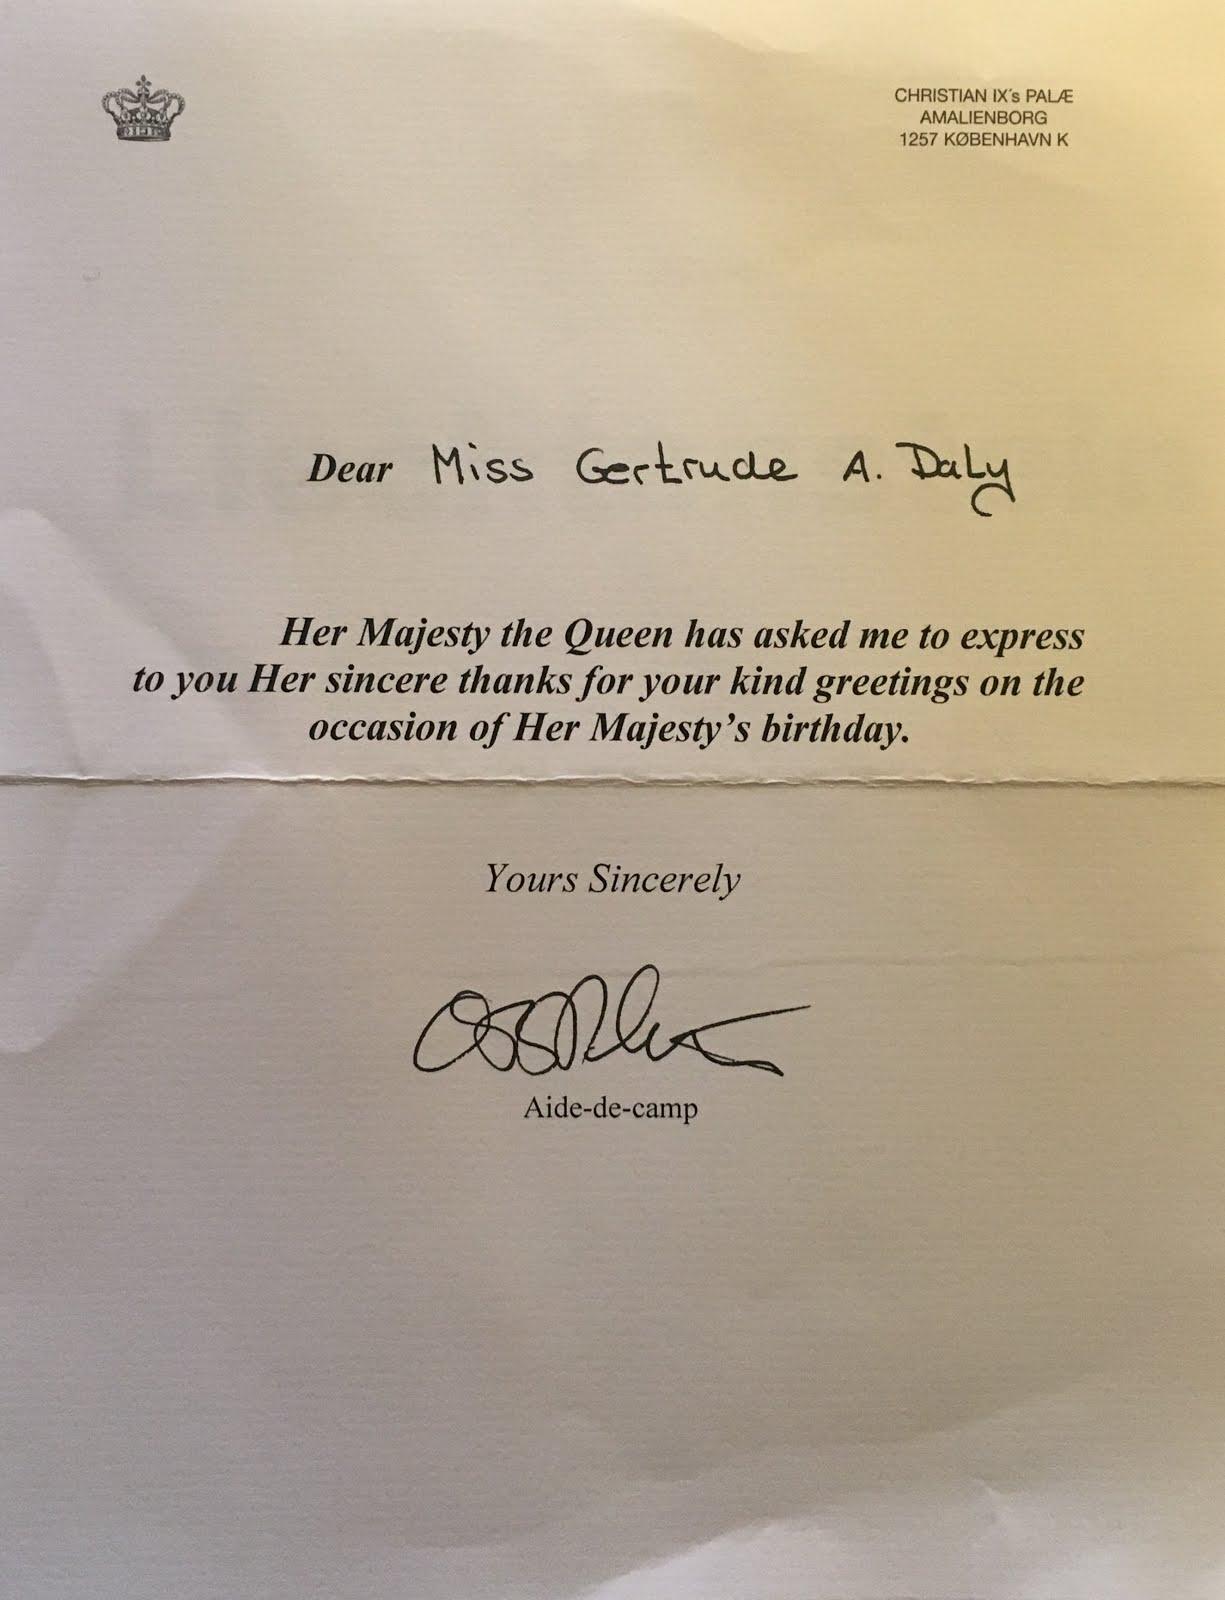 Gerts Royals Queen Elizabeth Queen Margrethe Birthday Reply 2017